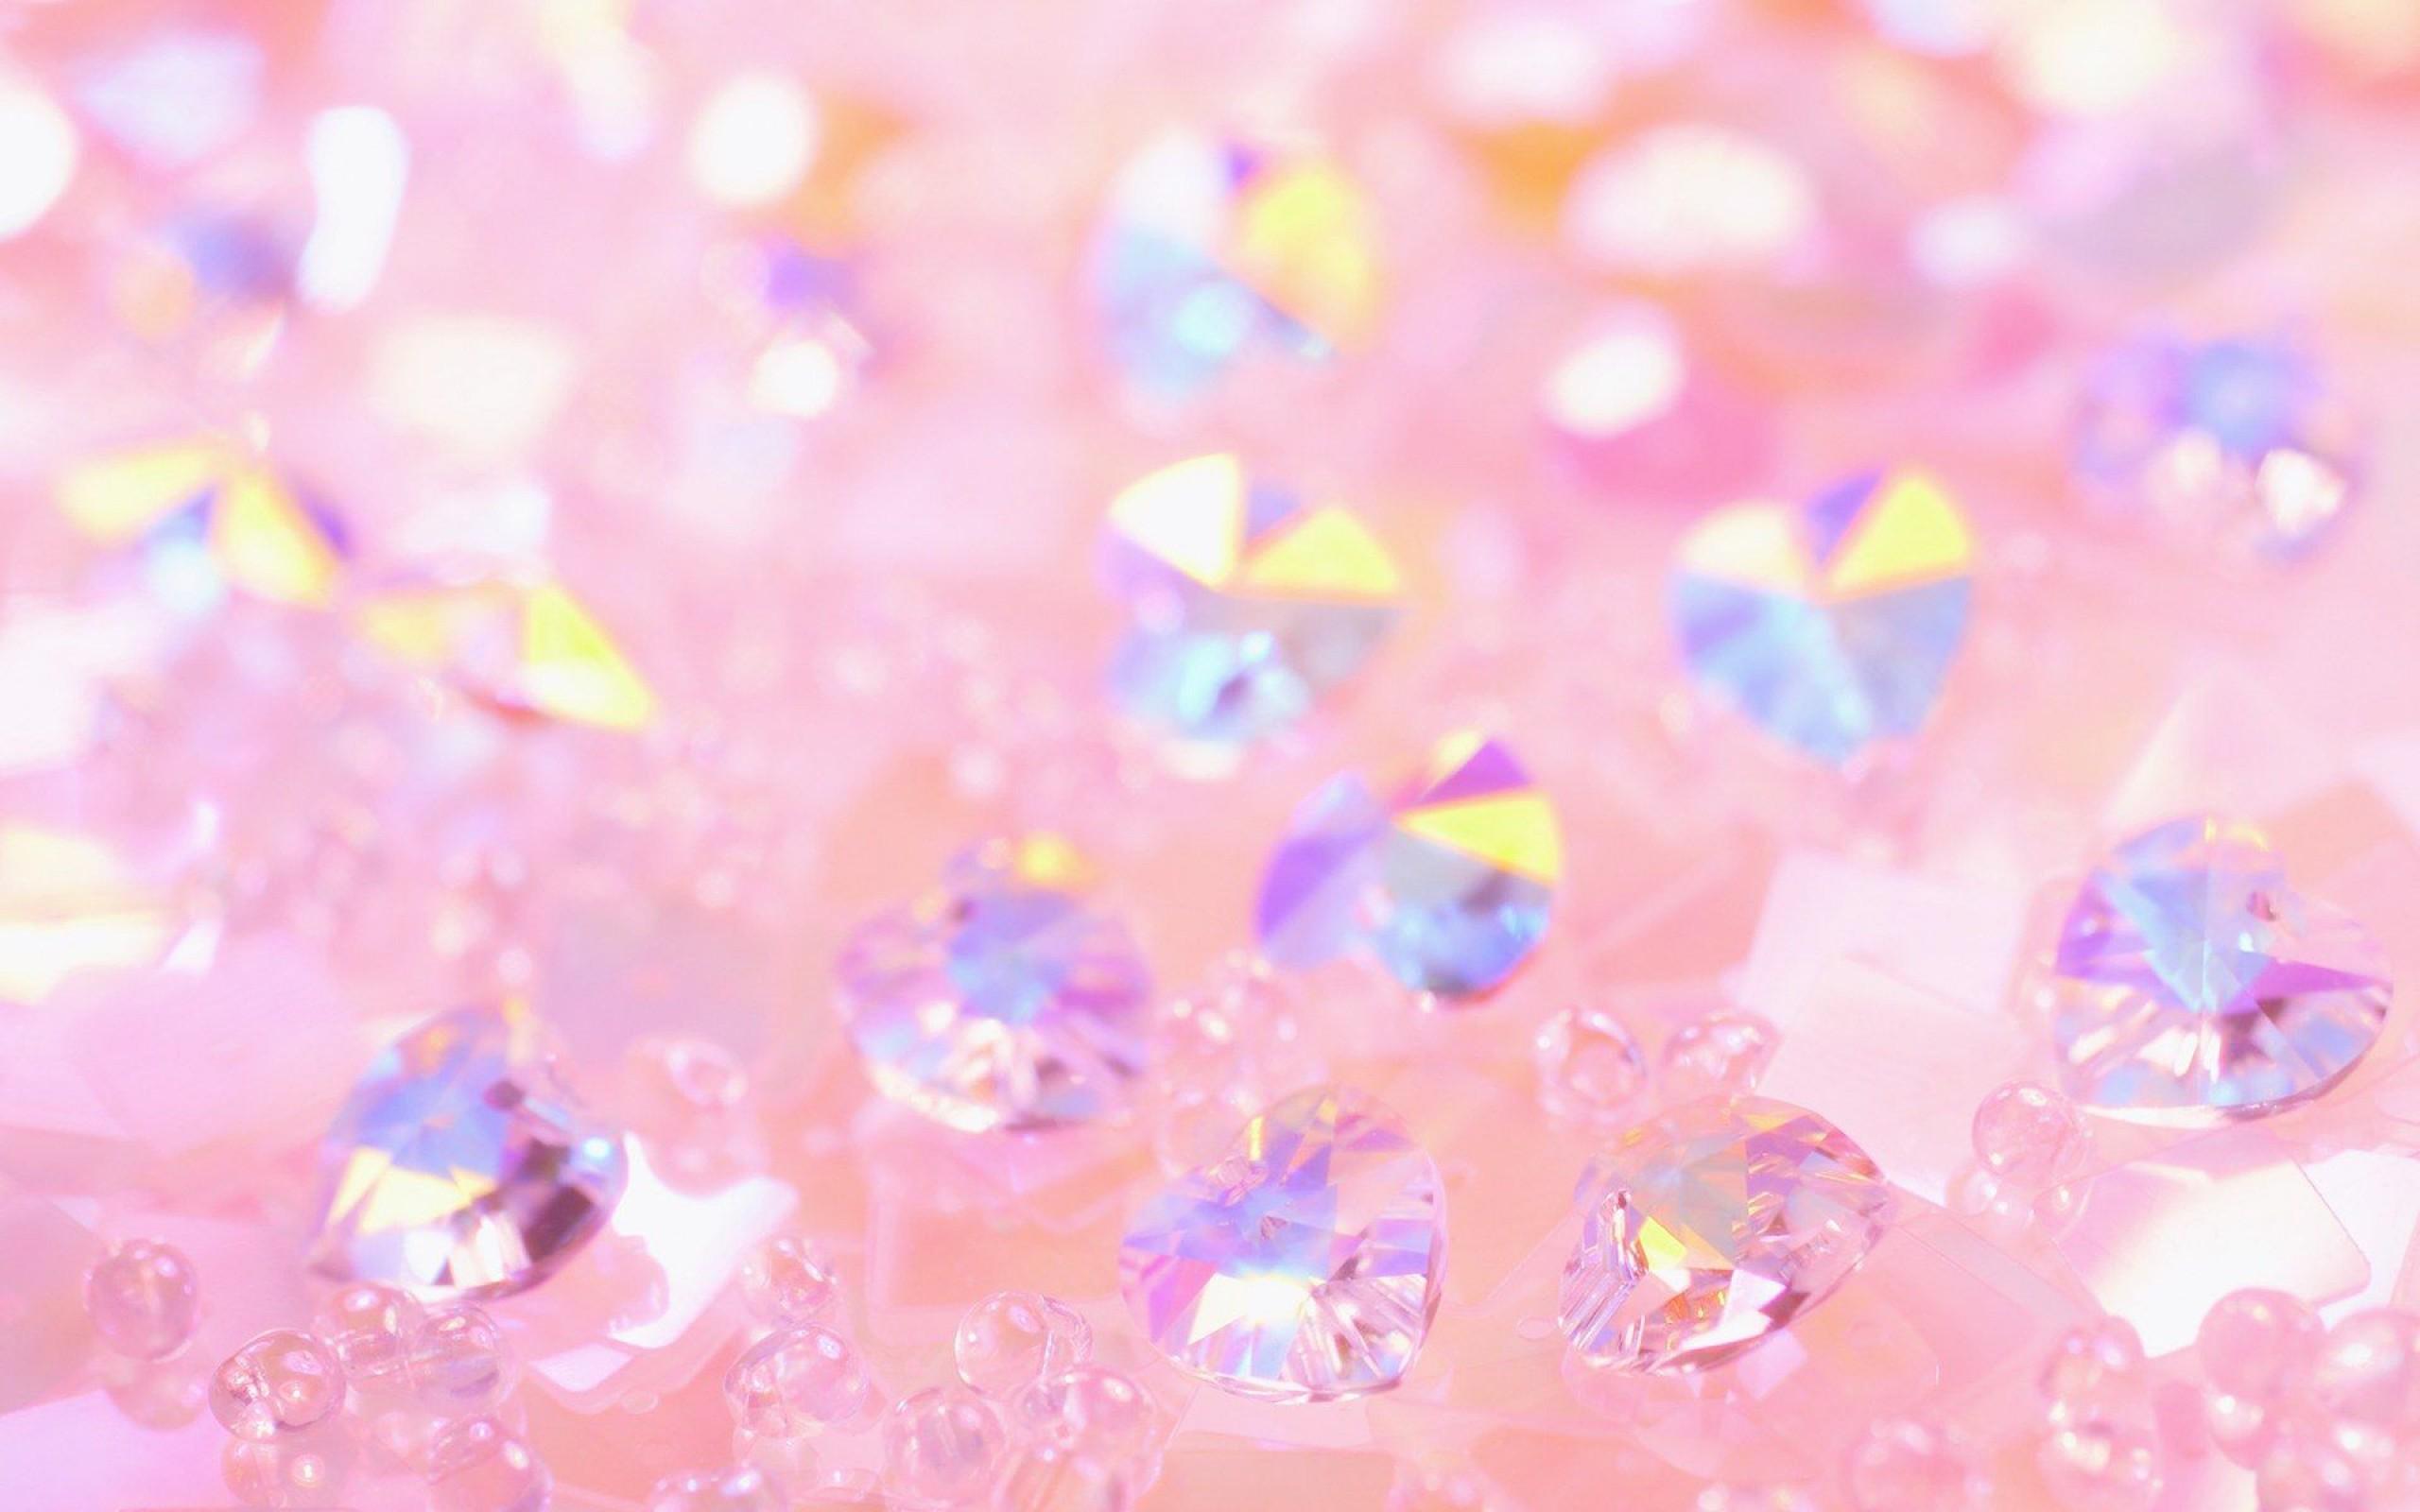 2560x1600 Wallpaperwiki Images Pink Glitter Wallpaper HD PIC